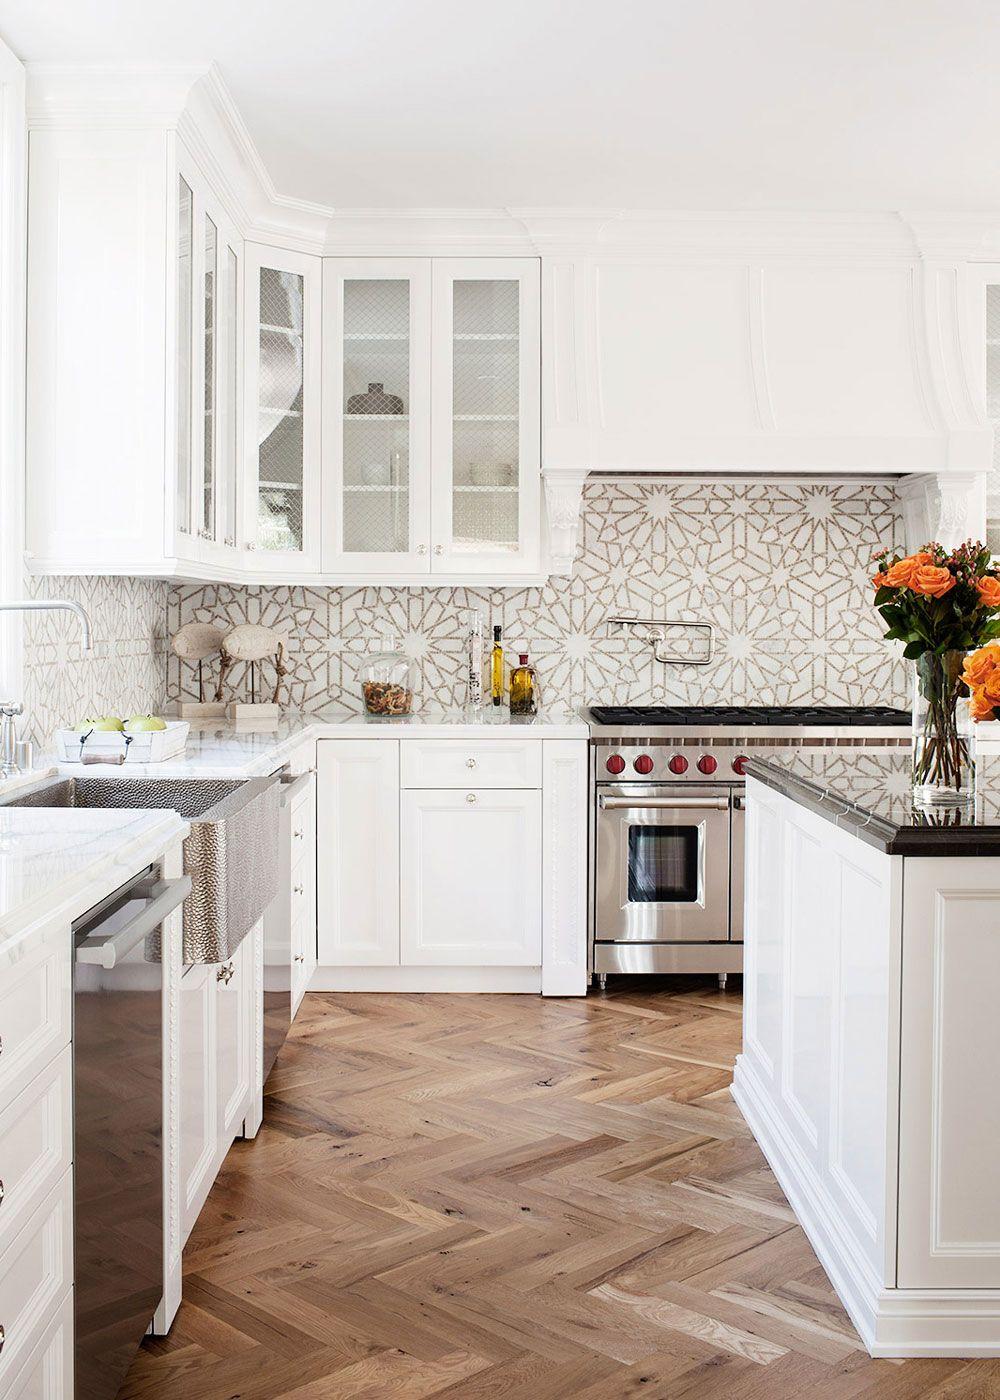 Kitchens I Like | Kitchens, Interiors and House